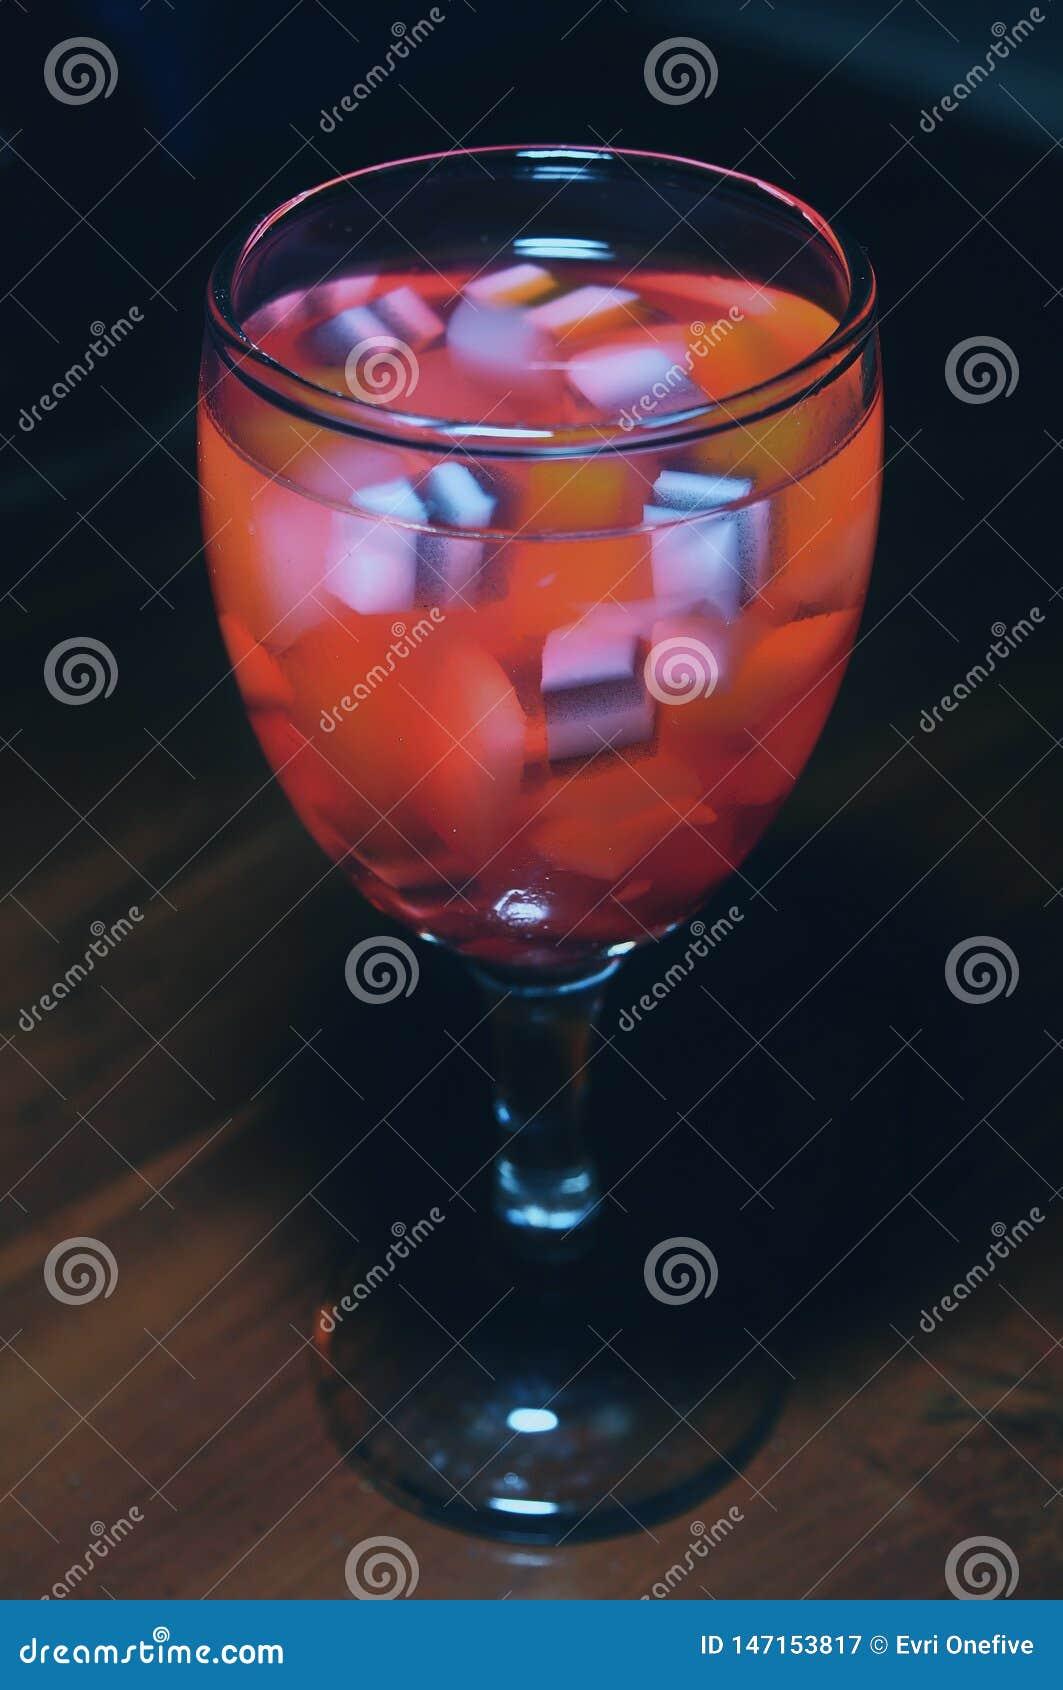 Es Campur koktajlu l?d - Galaretowy nap?j - Lukrowy deser robi? mieszana galareta i truskawkowy syrop